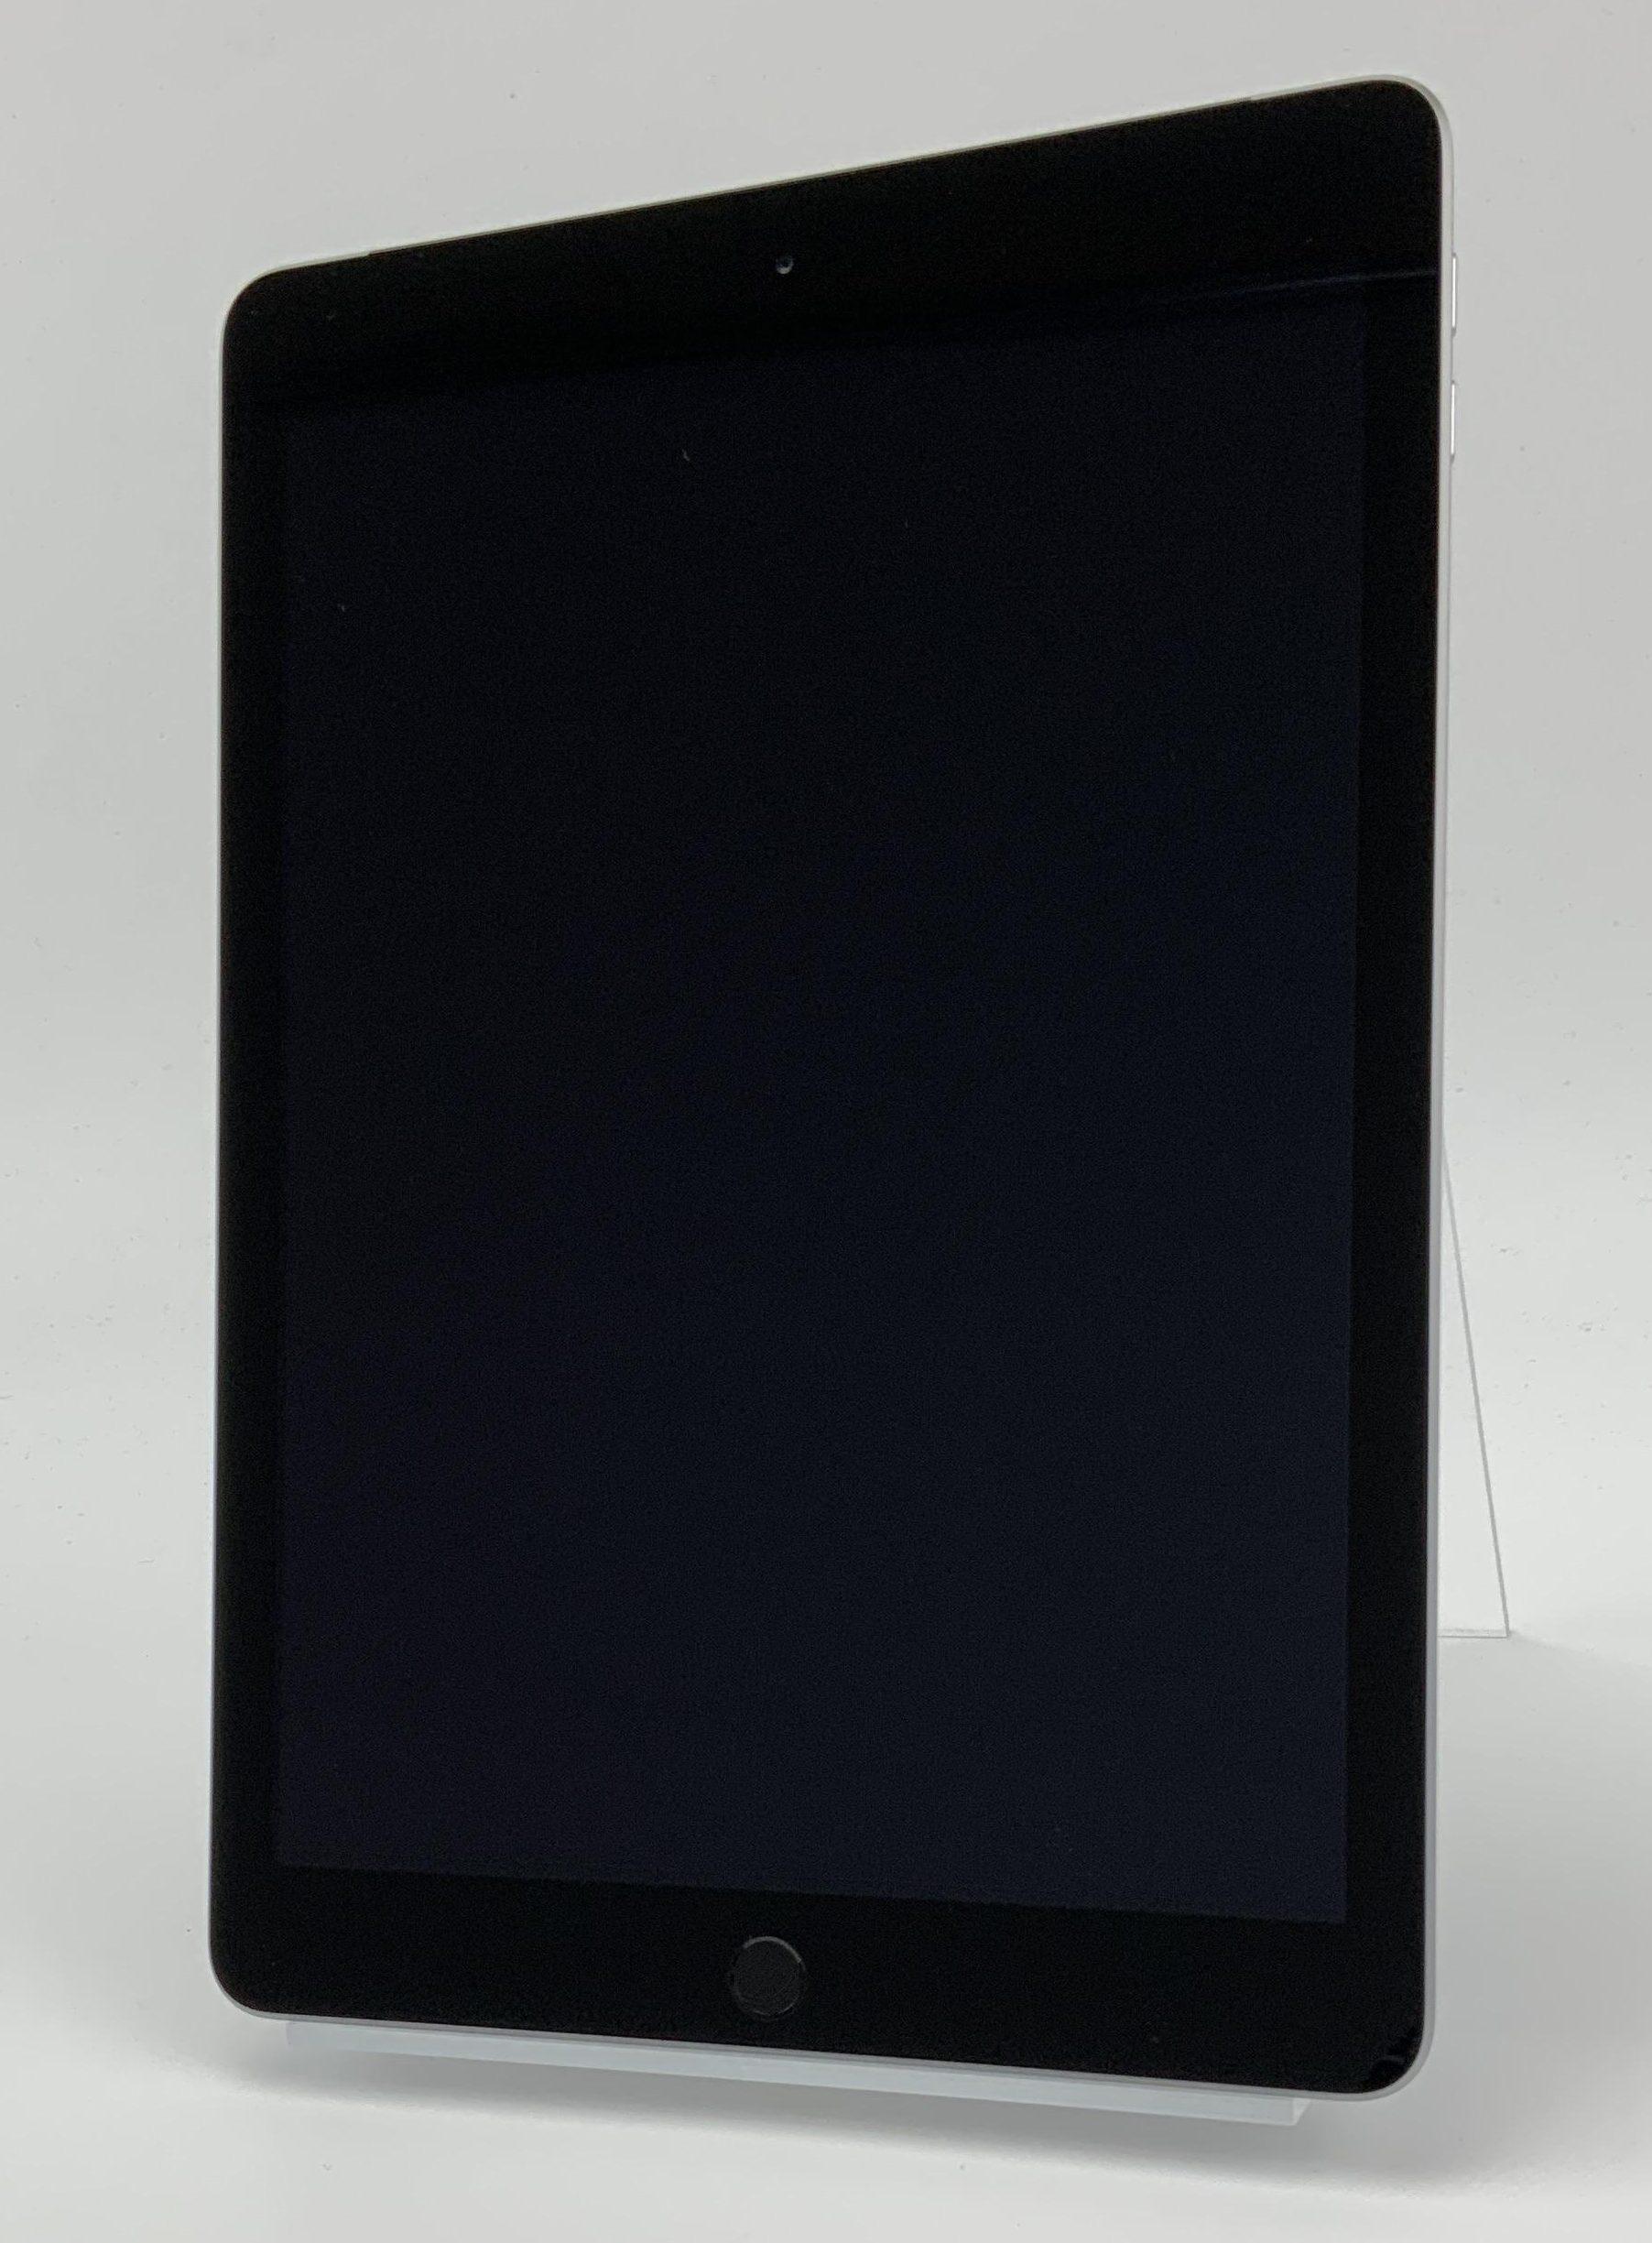 iPad 5 Wi-Fi + Cellular 32GB, 32GB, Space Gray, immagine 1